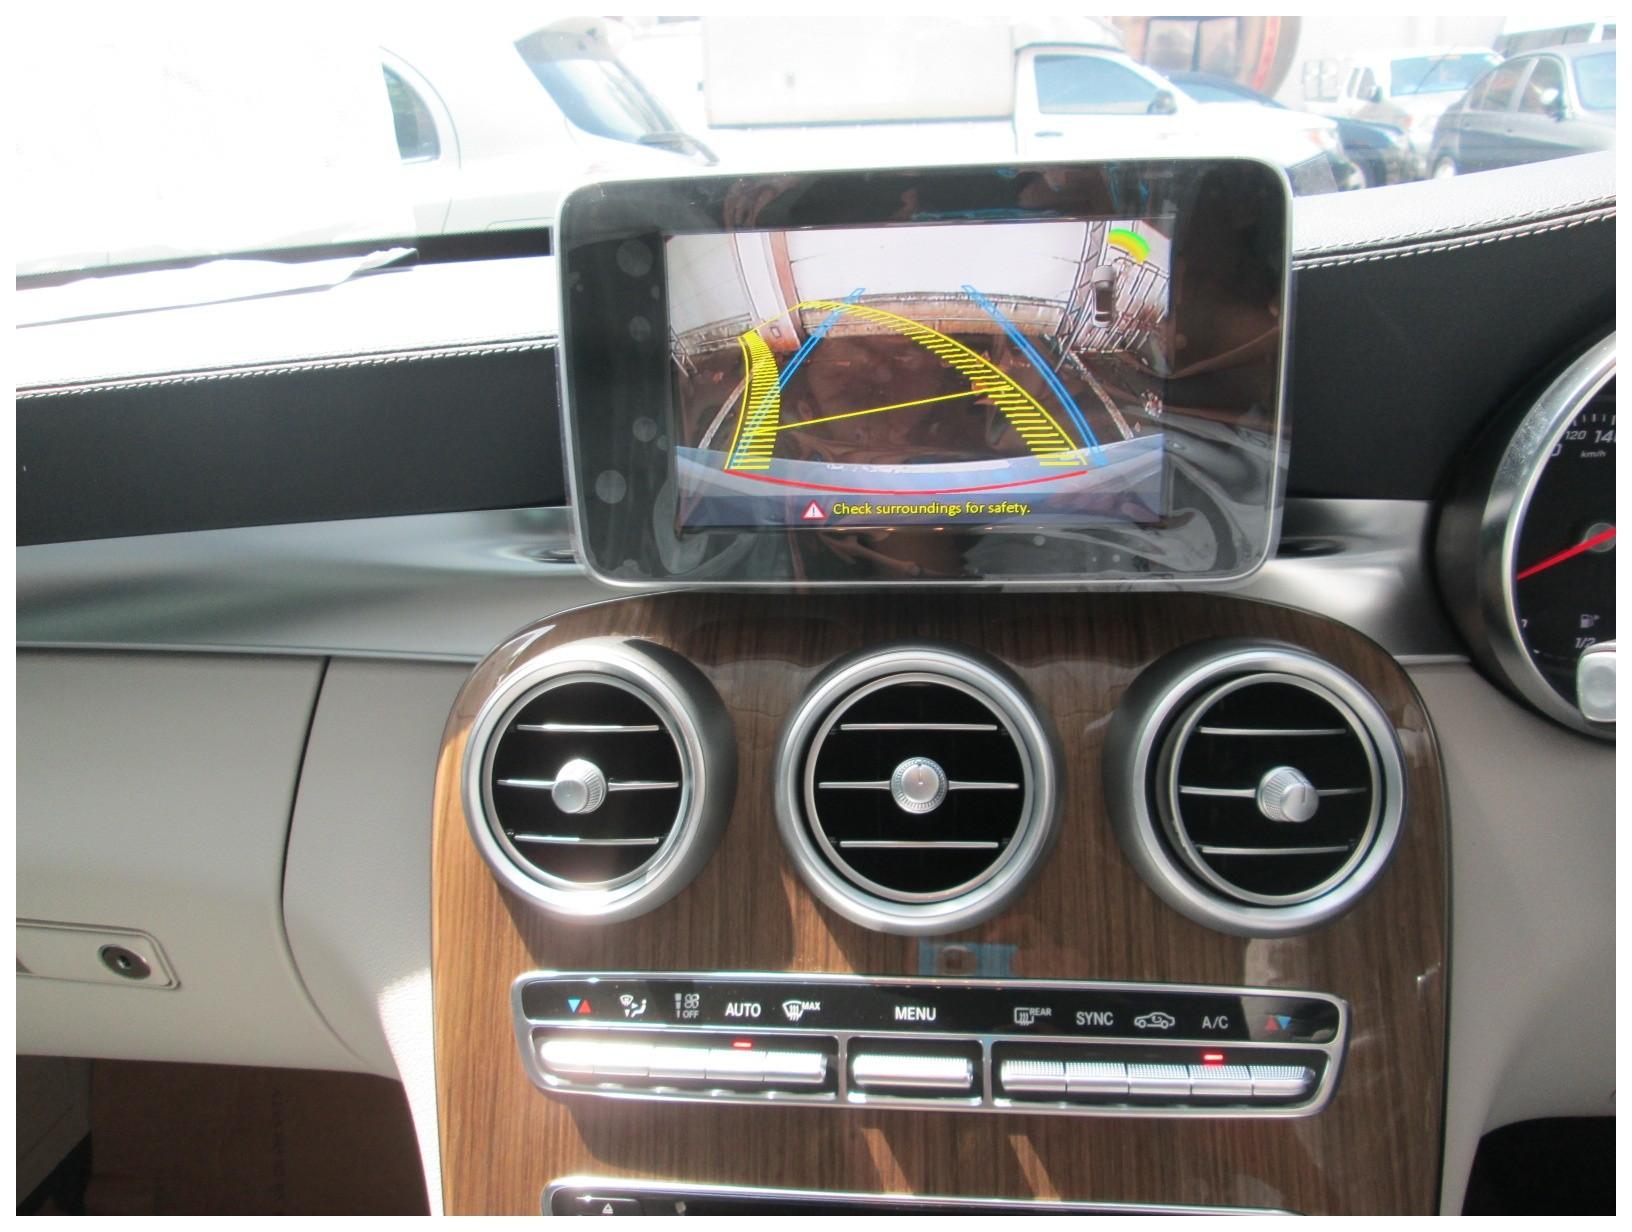 Rear Camera Benz,กล้องมองหลัง,กล้องถอยหลัง,Benz, Mercedes ,เบนซ์ ,เมอร์เซเดส, ซาลูน,ราคาเบนซ์,facelift ,Brabus ,AMG ,Bluetec ,Hybrid,ไฮบริด, gps, navigation, Speednavi, Map, Navigator, Automobiles, Motor show Bangkok ,Motor expo, ราคา, ใบราคา, pricelist ,มือสอง , โชว์รูม, แผนที่, จีพีเอส, นำทาง,รีวิว, ทดสอบ,เนวิเกเตอร์, ประเทศไทย,ทีวีดิจิตอล,Digital TV,ทีวี,Rear camera,จอถอยหลัง,กล้องมองหลัง,กล้องถอยหลัง,หมุนตามพวงมาลัย,PAS,Park assistant system, carplay , android auto, screen mirroring, ภาพมือถือขึ้นจอรถยนต์ ,กล้องบันทึกเหตุการณ์ ,กล้องบันทึก, กล้องติดหน้ารถ, กล้องวีดีโอ, DVR, Driving Video recorder, thinkware, Blackvue, ,carcamkorea ,กล้องวีดีโอ, test drive ,